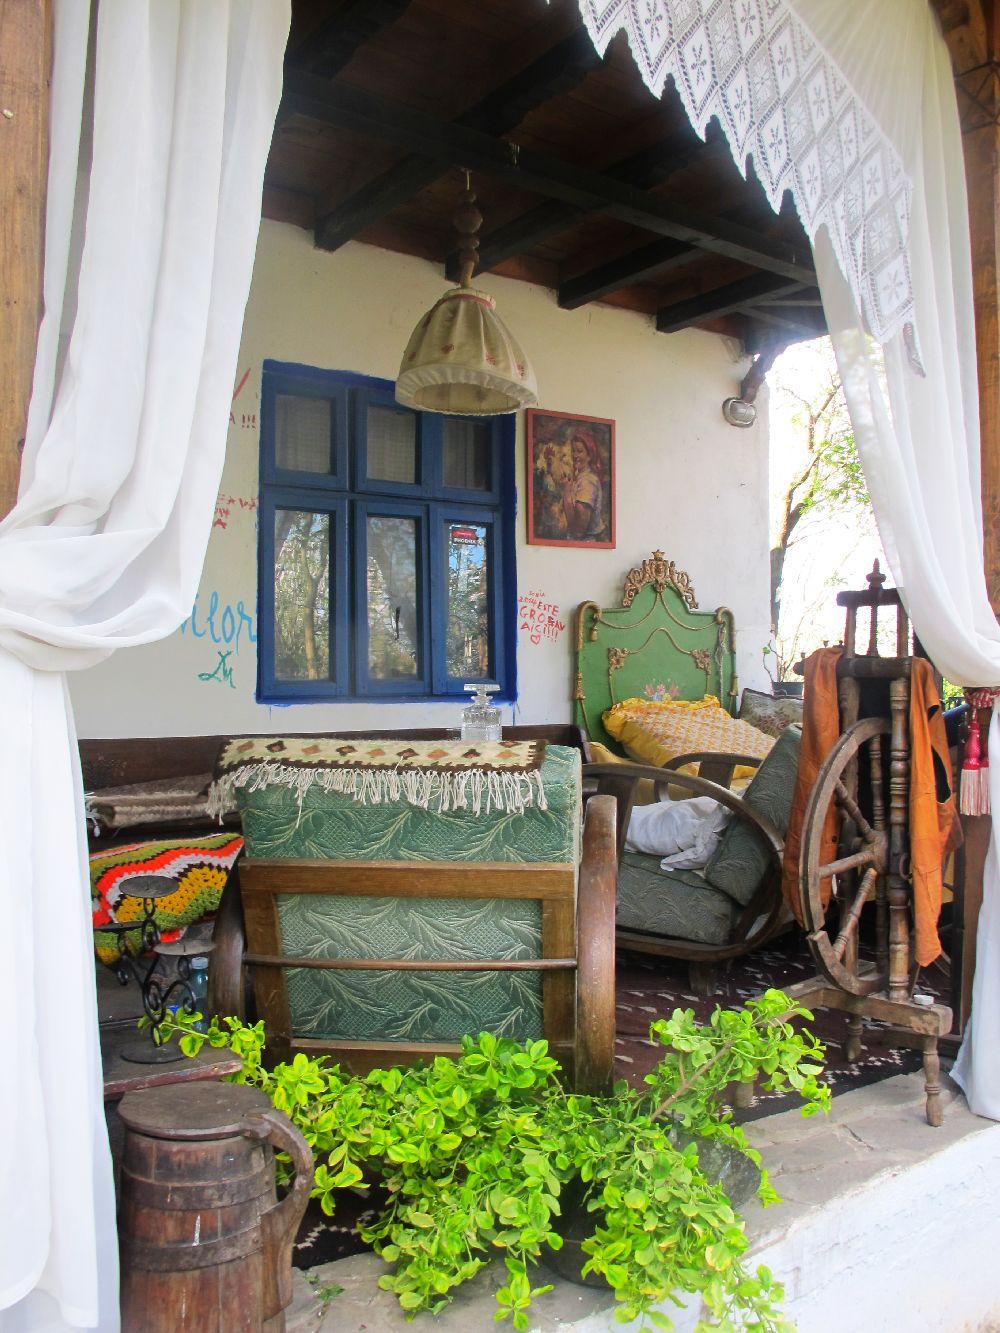 adelaparvu.com despre casa Ioanei Craciunescu, casa taraneasca romaneasca (99)